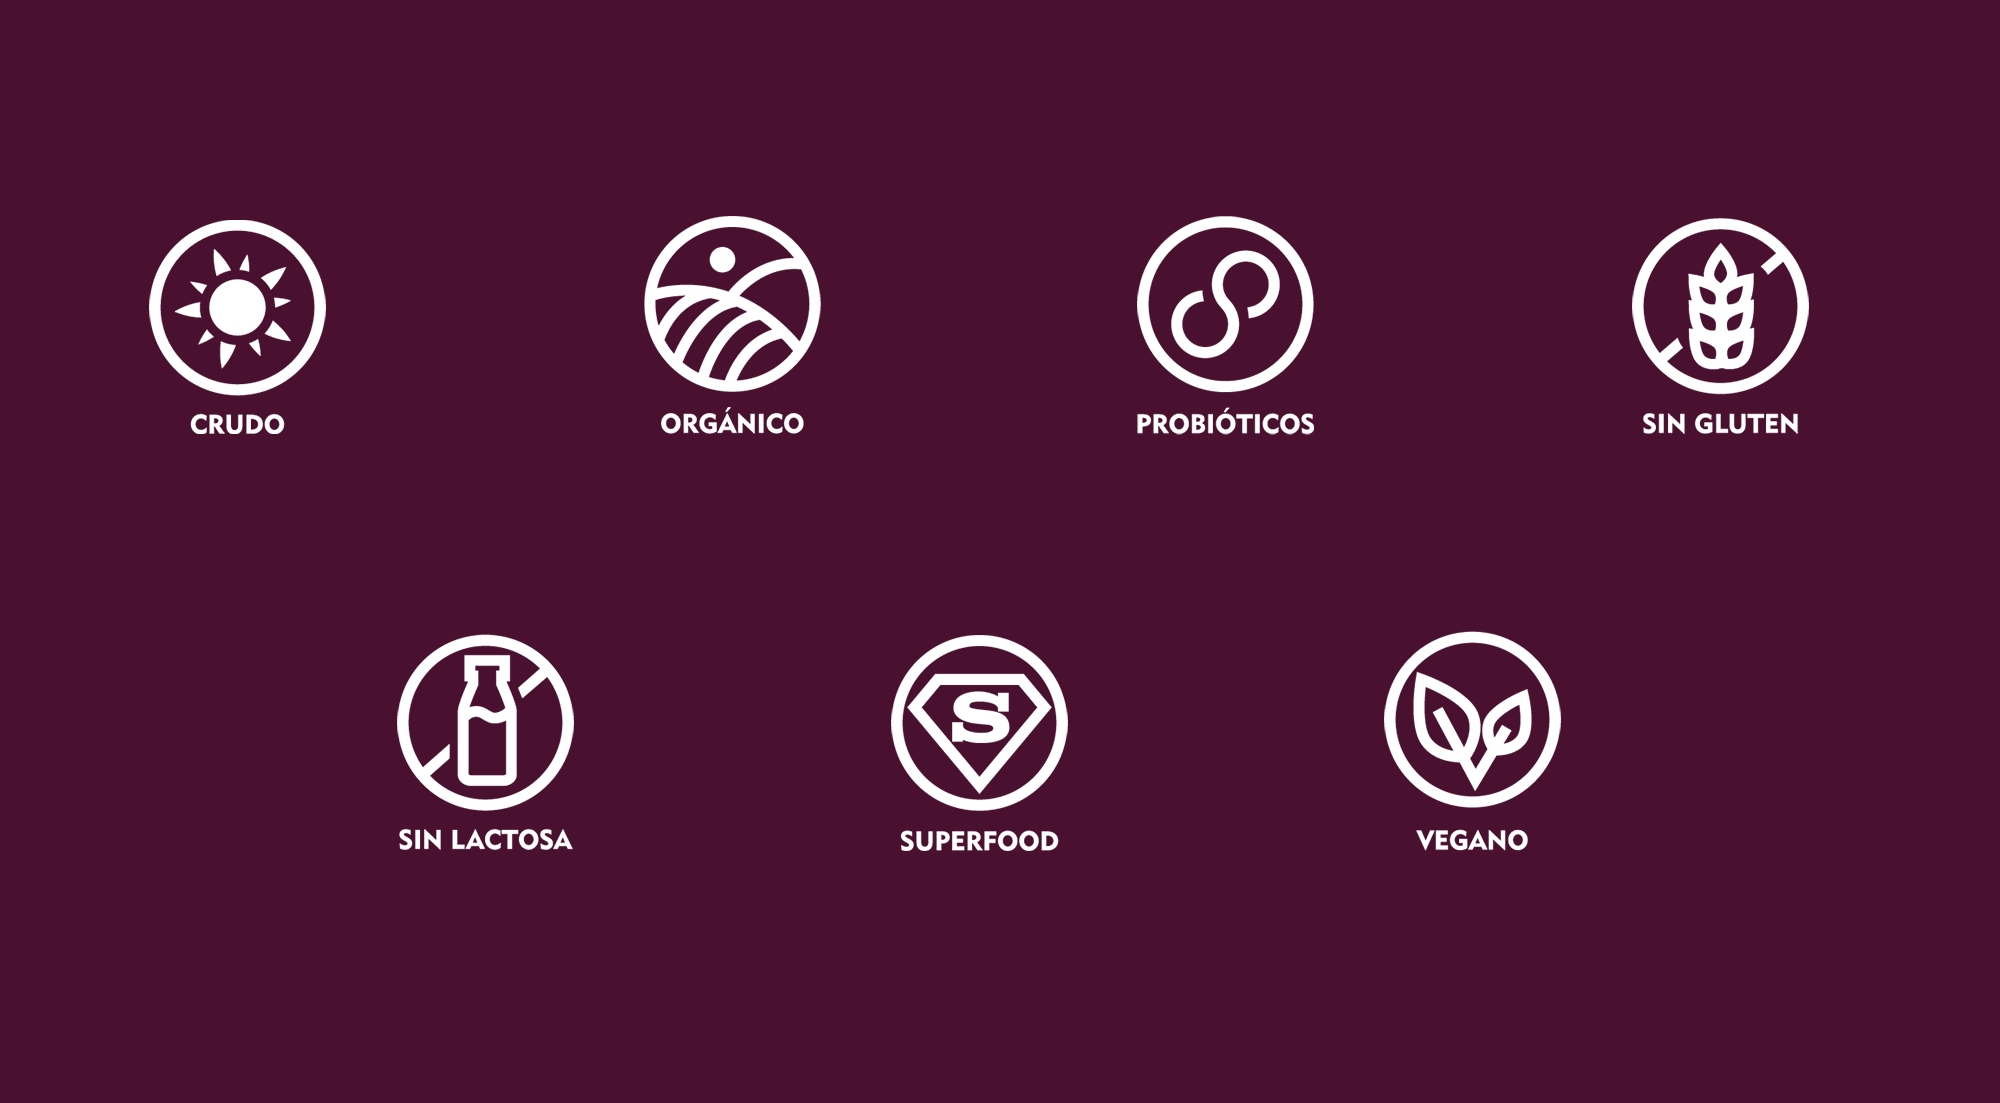 New icon set